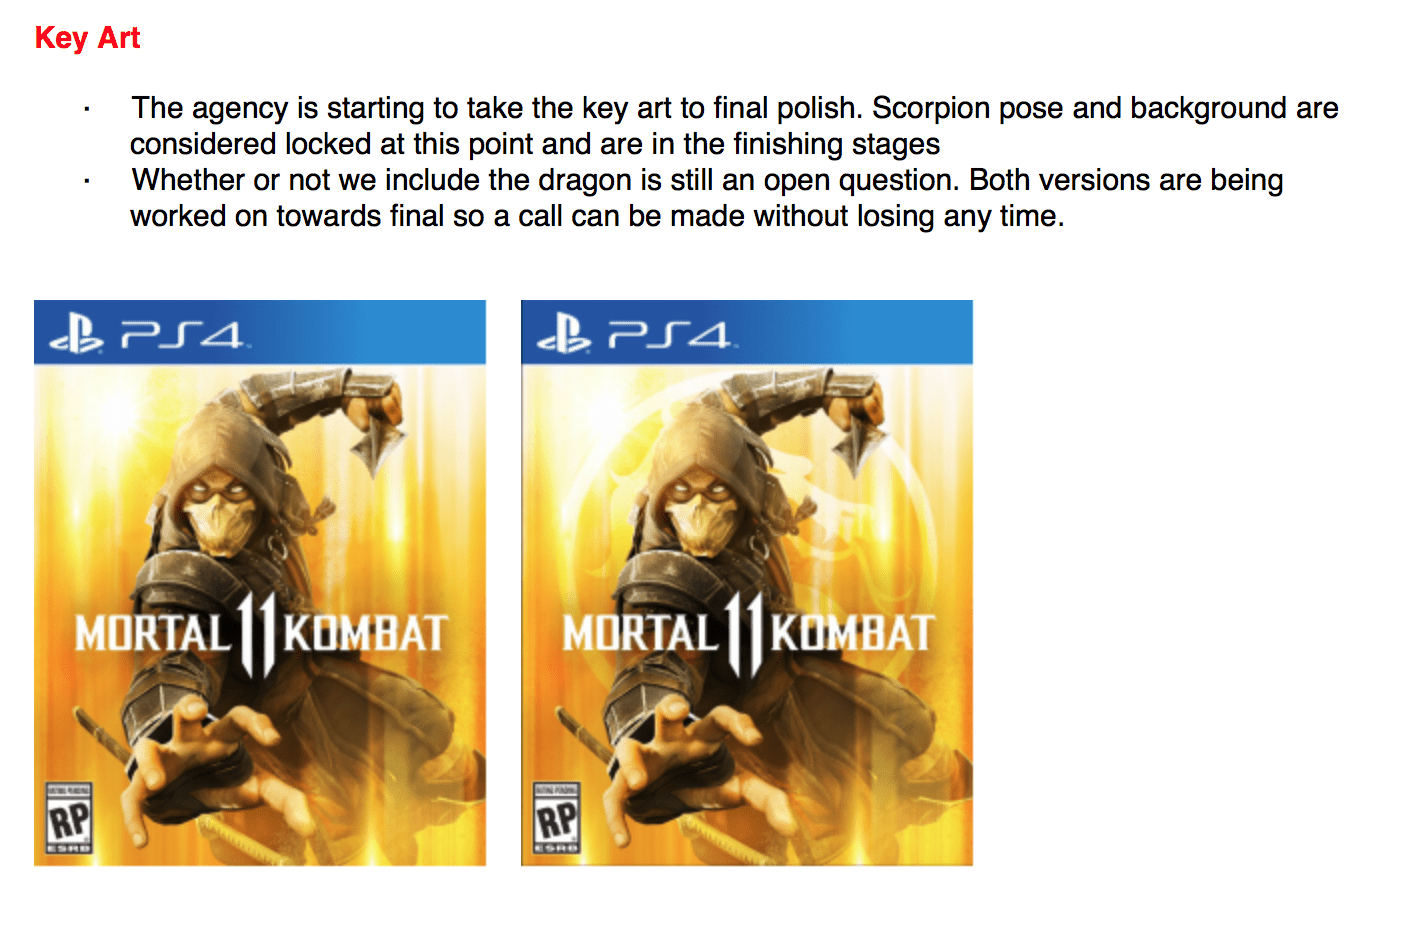 mortal kombat 11 box art 2 - New Mortal Kombat 11 Leaked Details - New Fighter Name, TV Series and More!